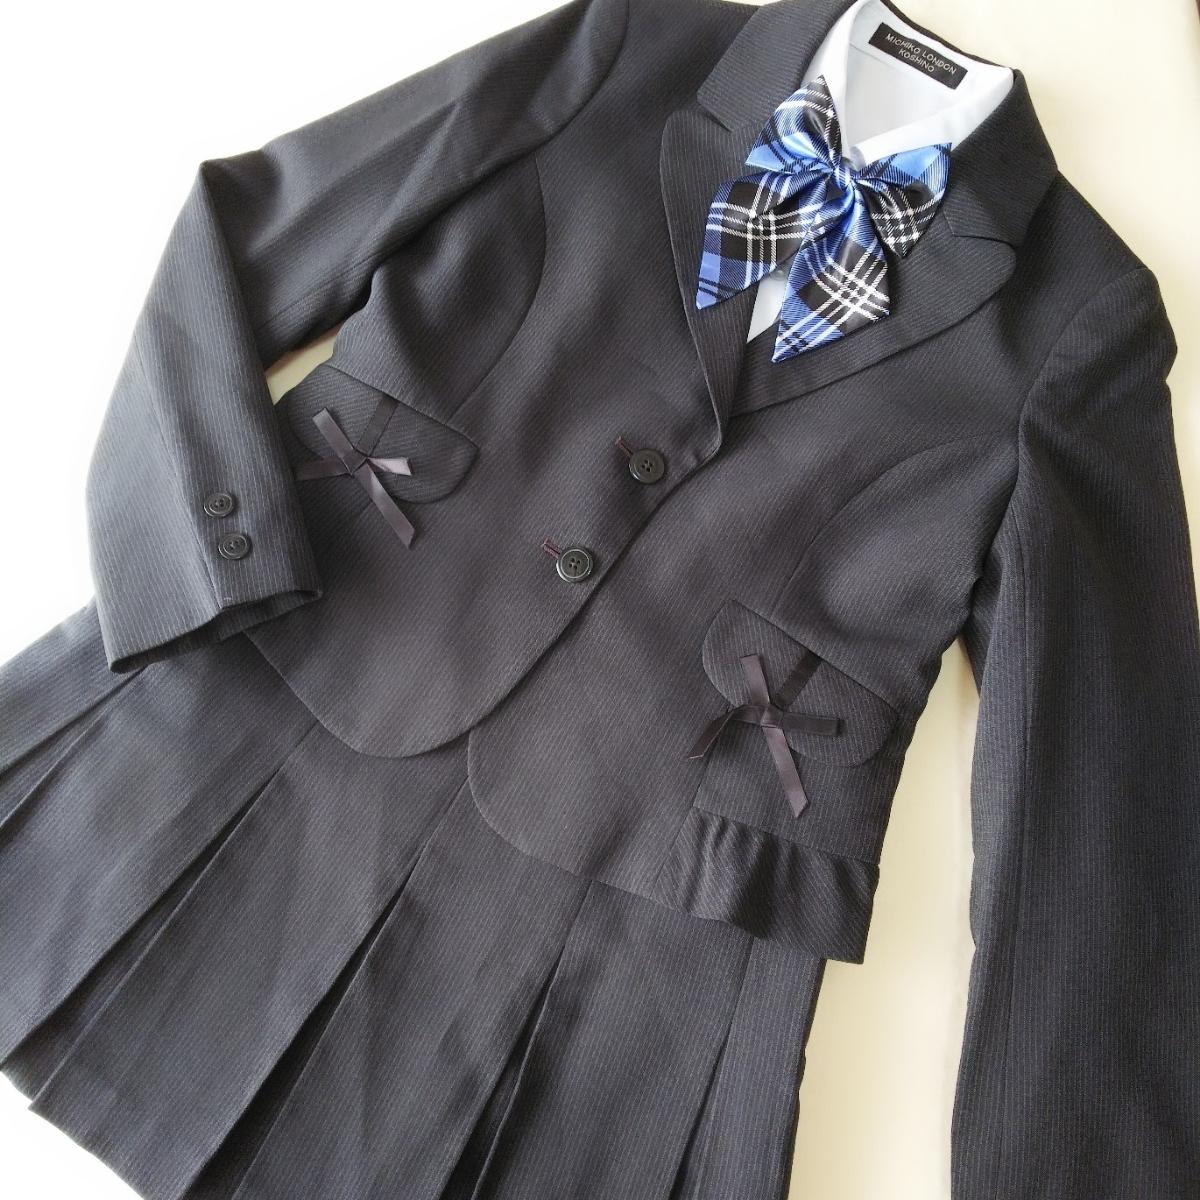 040034ccf80ca  FP59 ミチコロンドン 150 女の子 女子 フォーマル スーツ 4点 セット グレー ストライプ ジャケット スカート